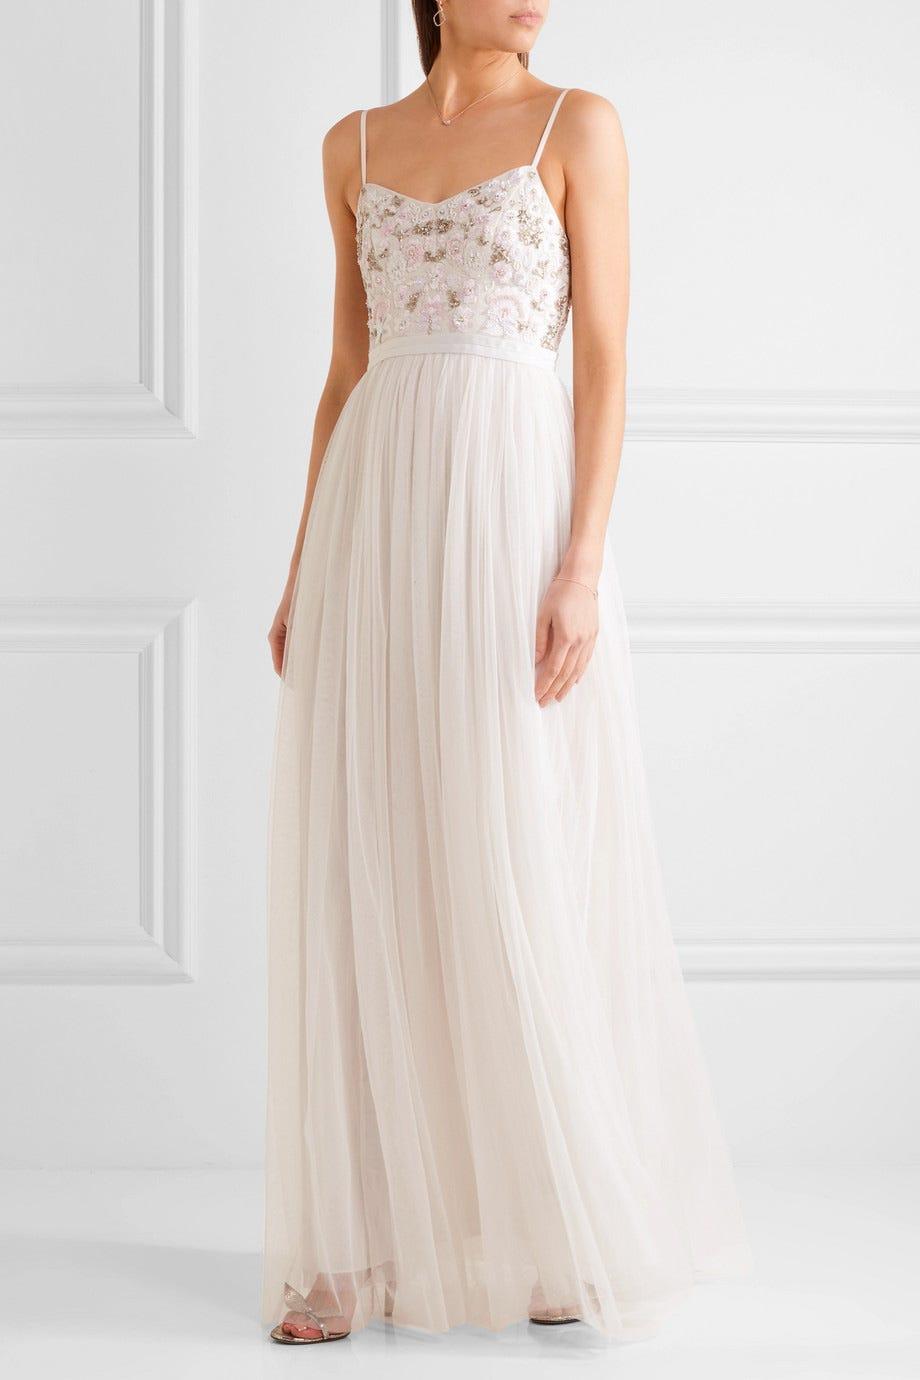 Under £500 Wedding Dresses - Cheap Bridal Gowns